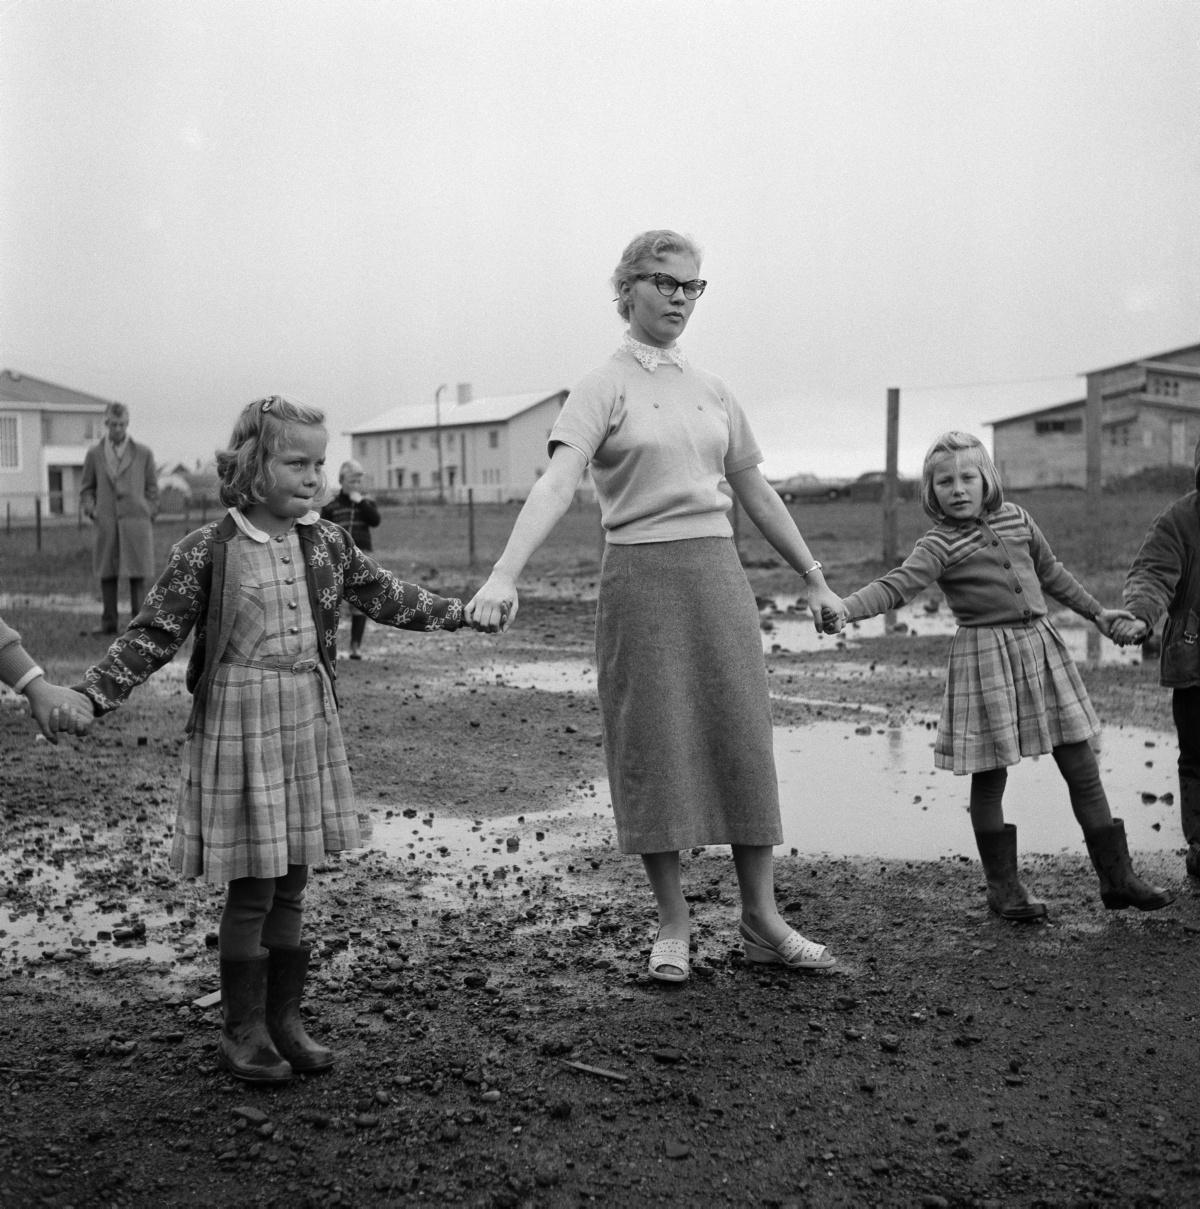 Gunnar Rúnar Ólafsson (1917-1965) Children and teacher at play in Selfoss, south Iceland, c. 1960.